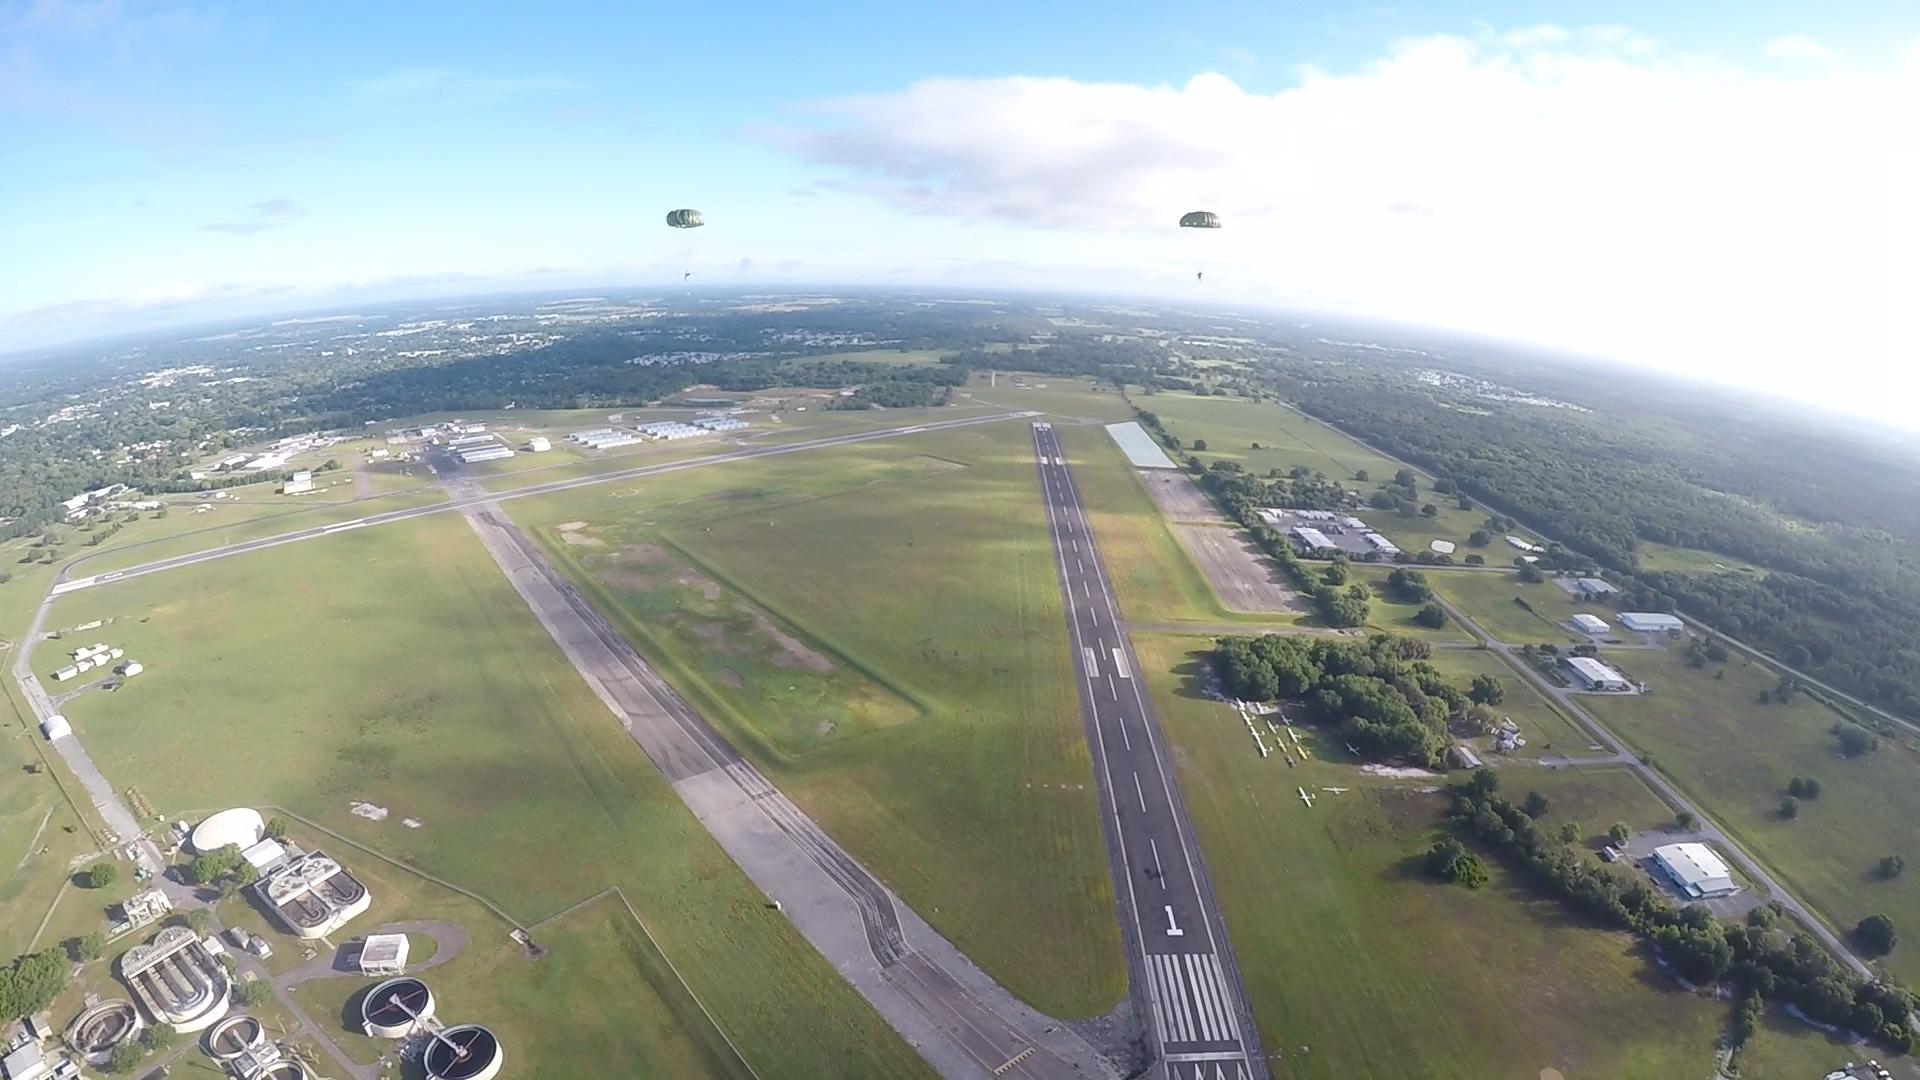 Airborne - 160423 - 1 and 2.jpg